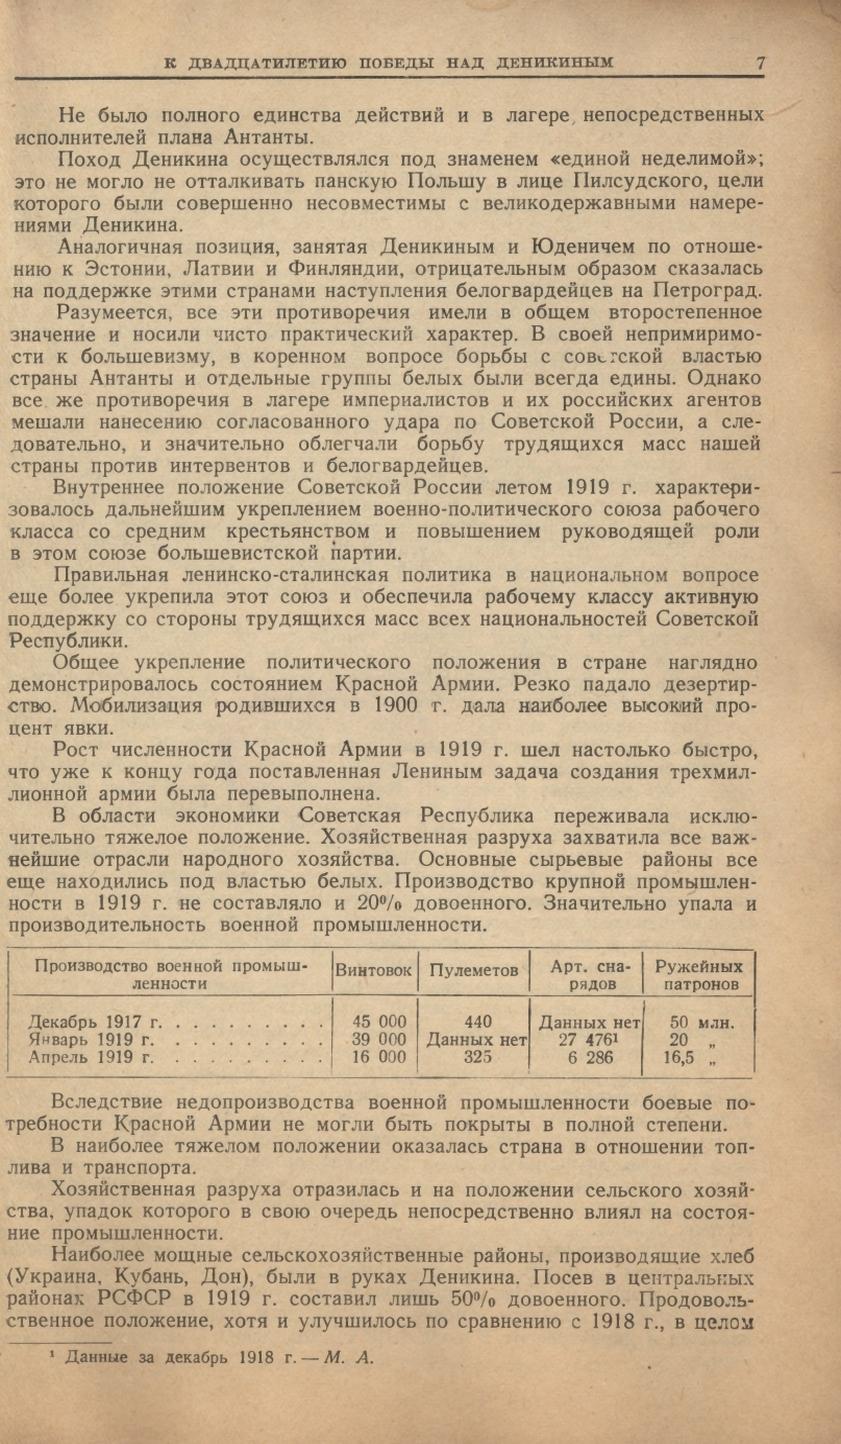 http://i3.imageban.ru/out/2014/01/15/046feb4a82ae8a7774c116ee52a5b463.jpg